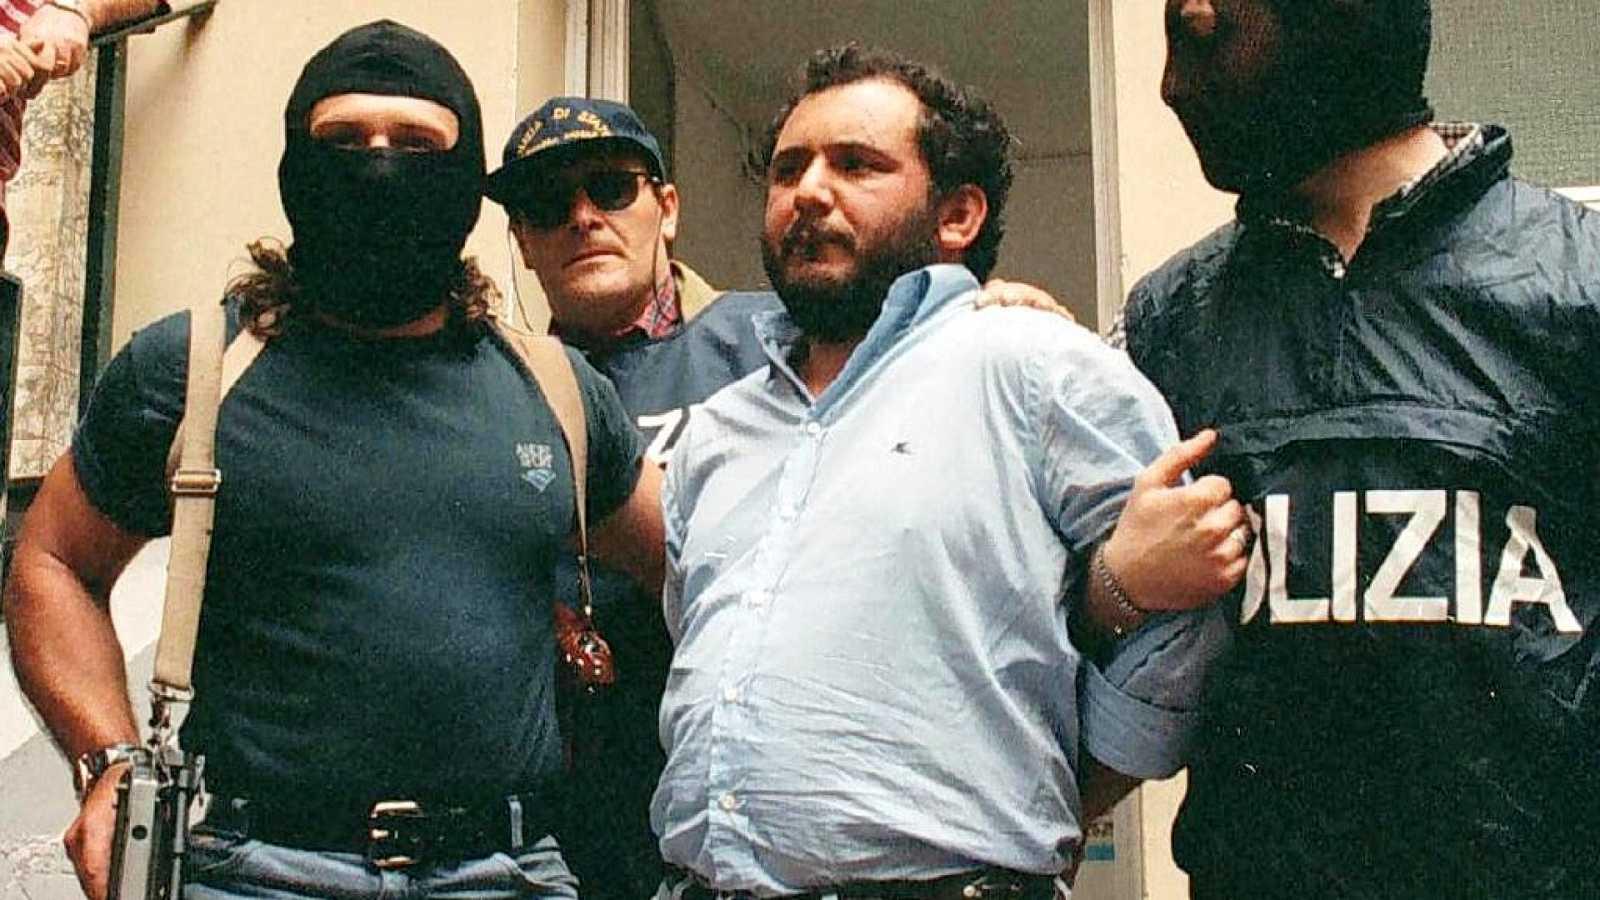 Liberan en Italia al mafioso Giovanni Brusca, ex-mano derecha de Toto Rinna y ejecutor del atentado al juez Giovanni Falcone